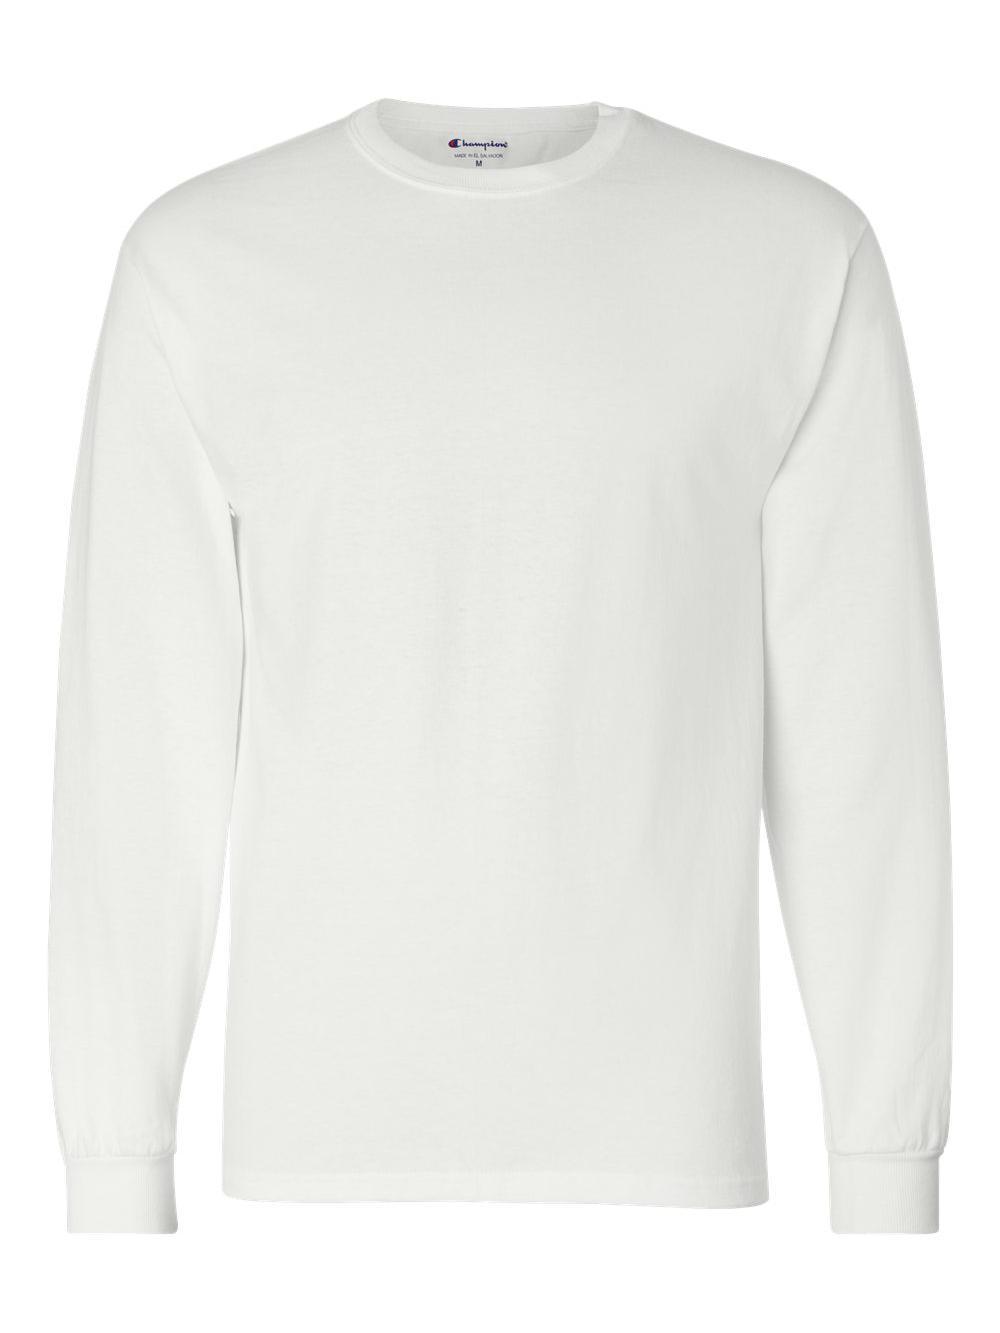 Champion-Long-Sleeve-T-Shirt-CC8C thumbnail 15